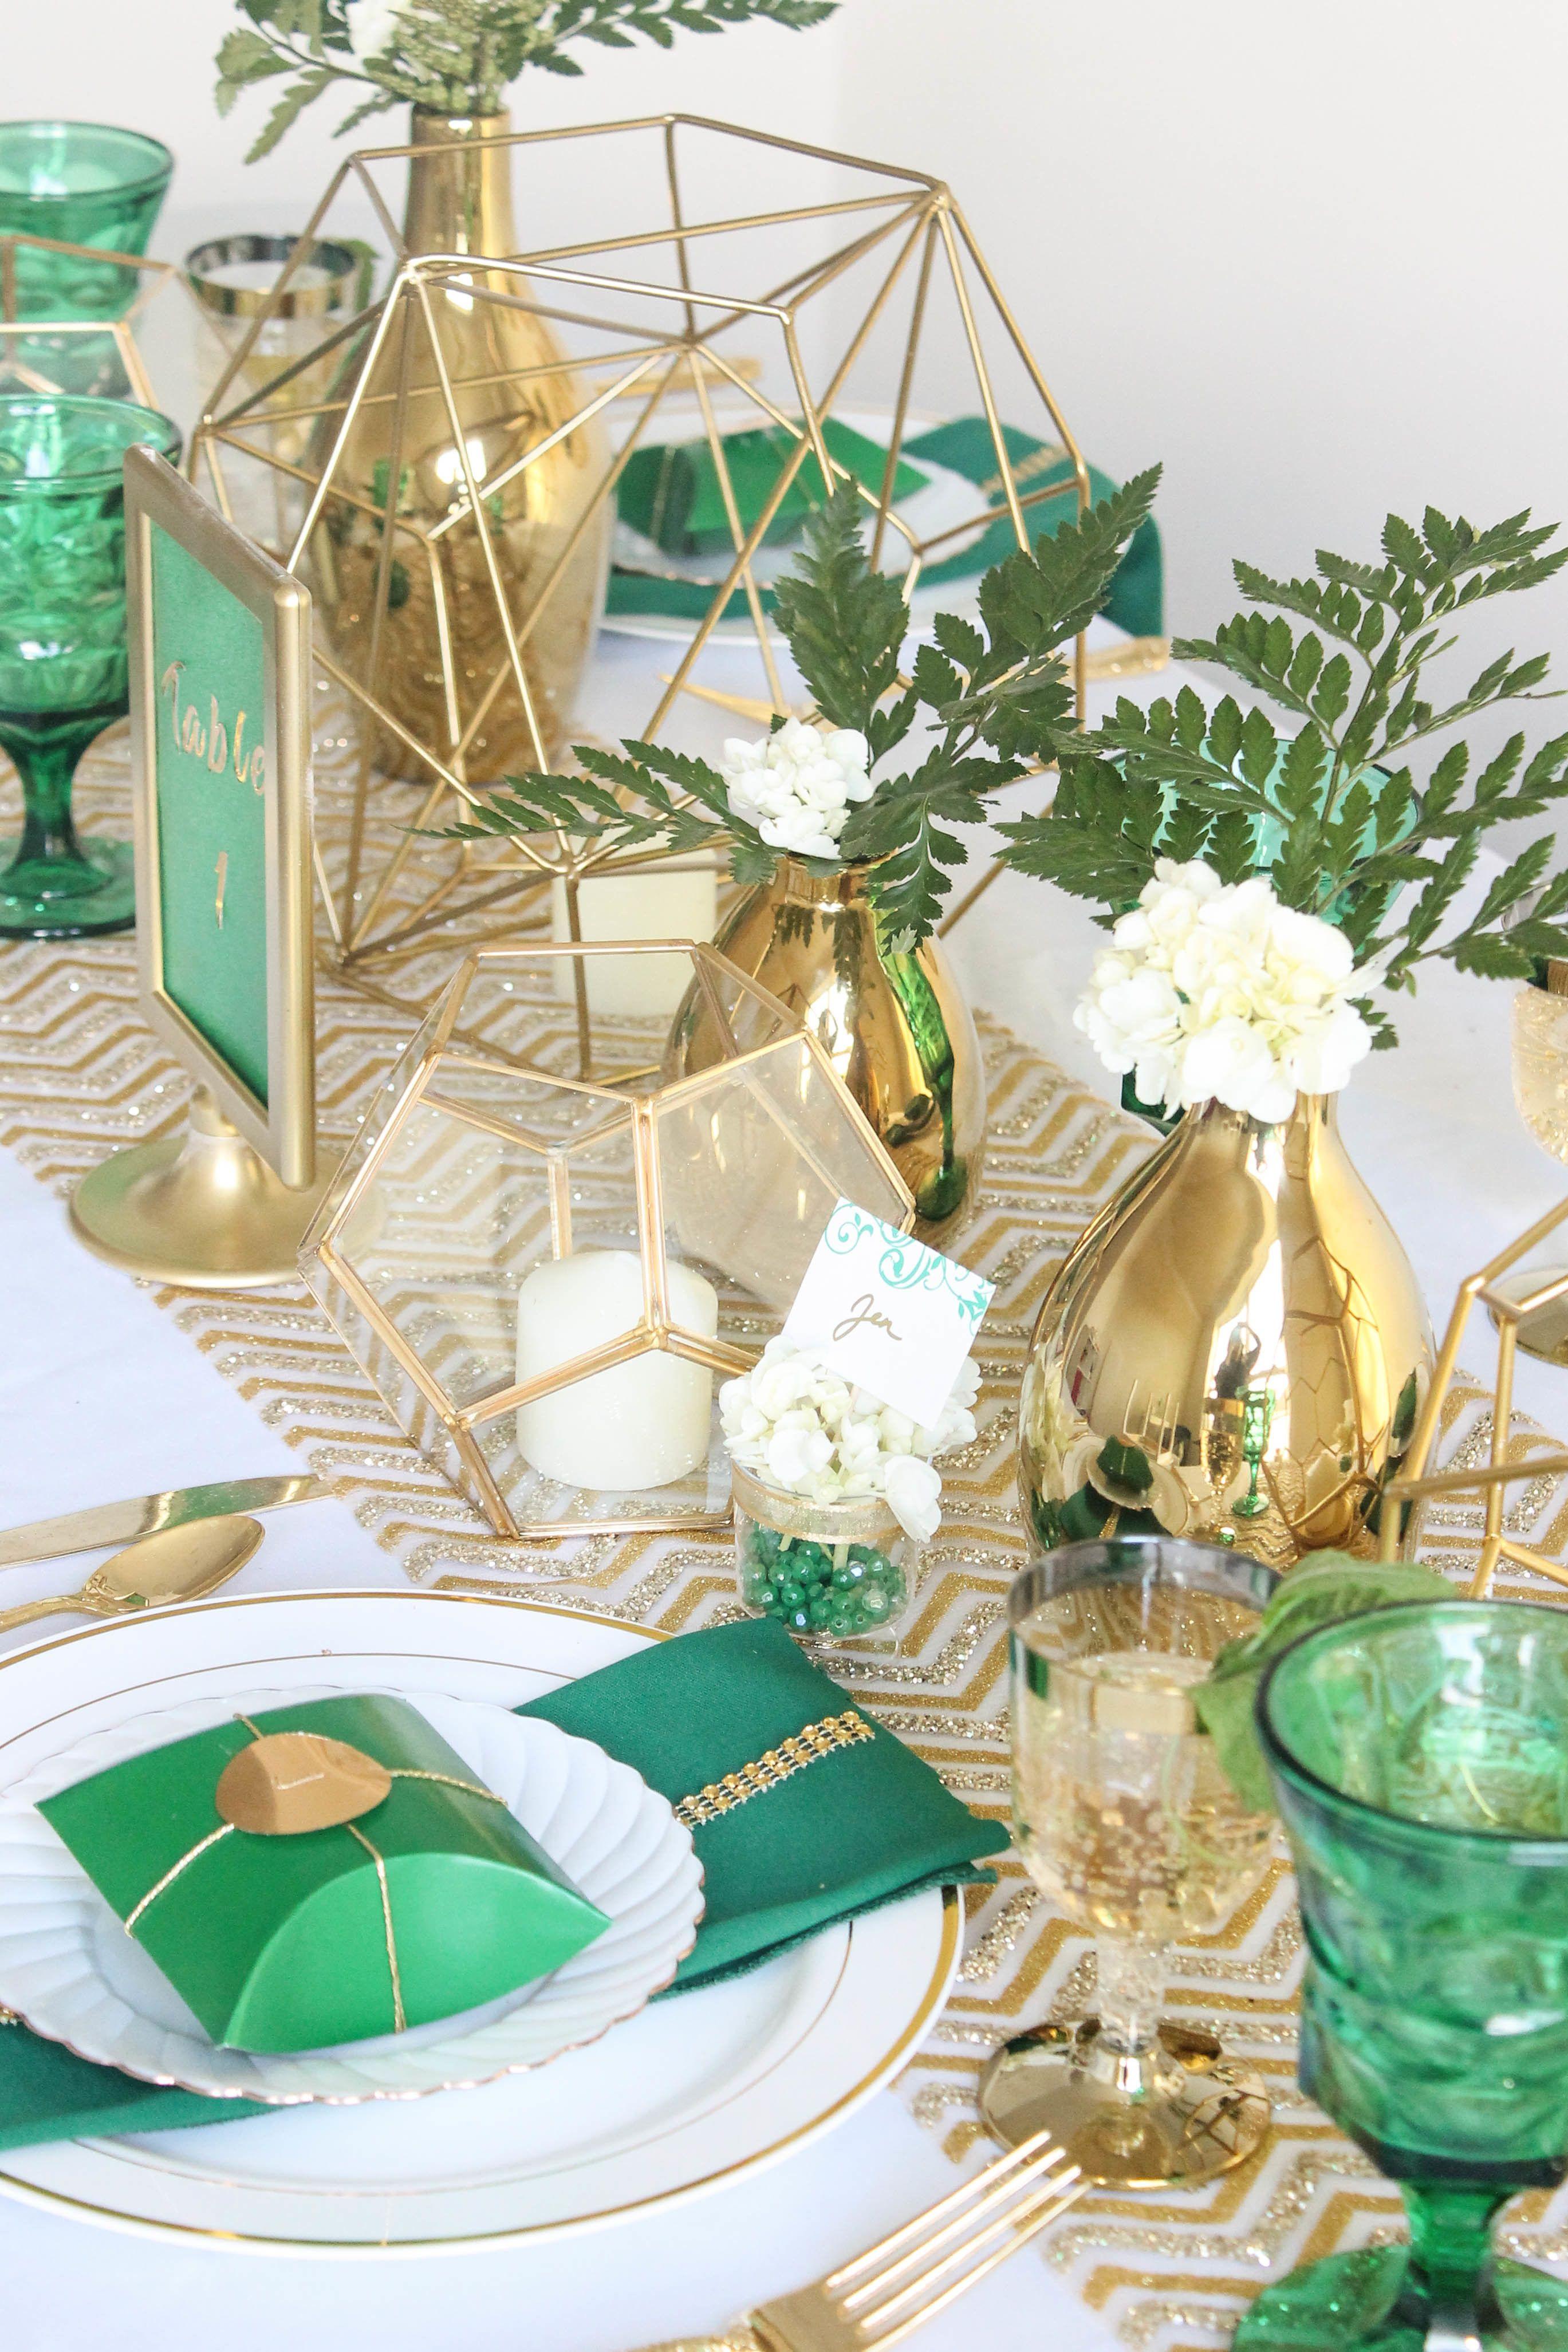 30++ Green and gold centerpiece ideas ideas